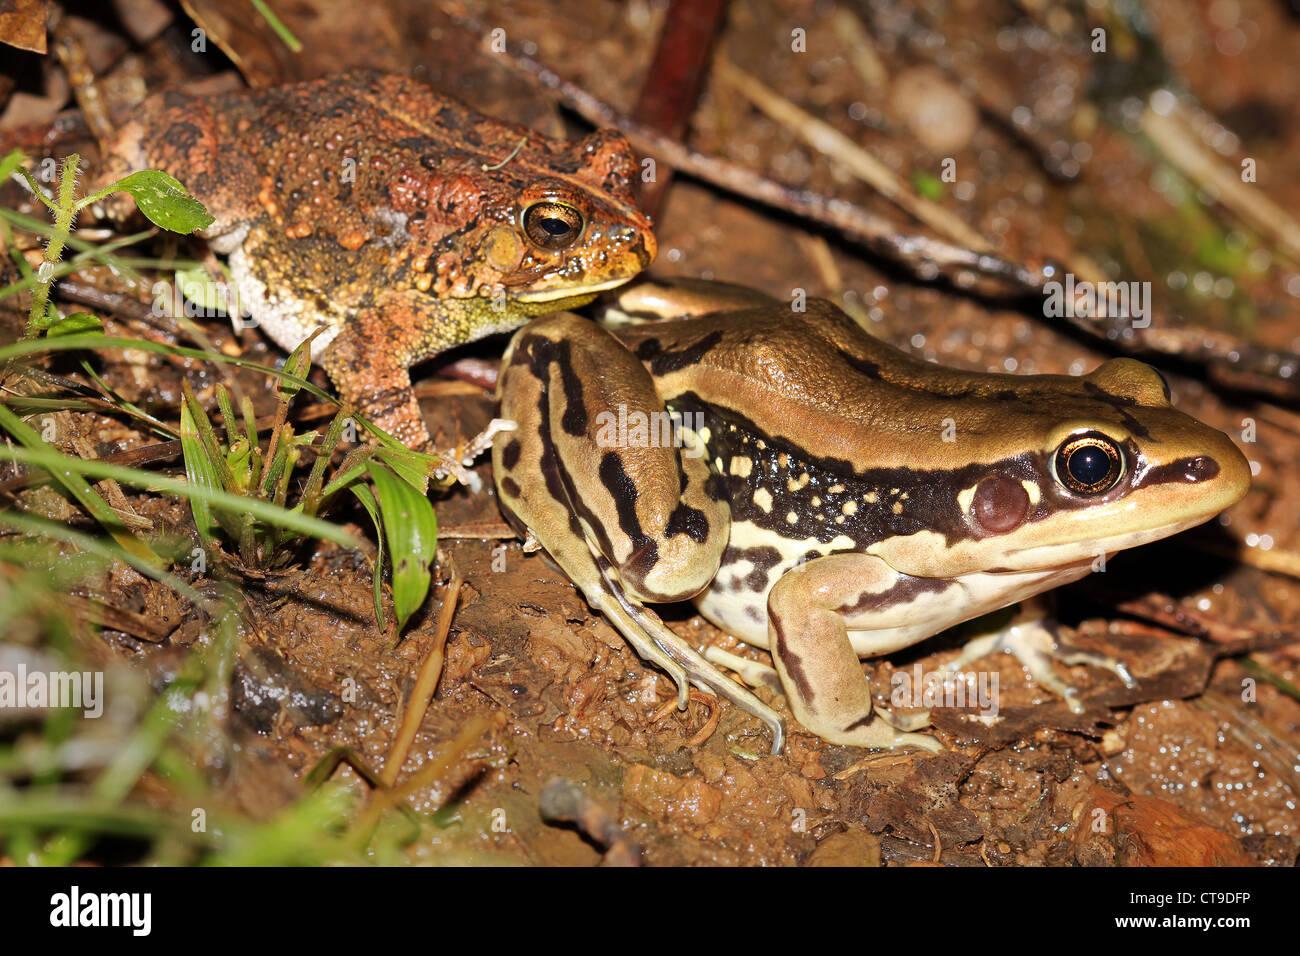 Galam White-lipped Frog (Hylarana galamensis) and TOAD in Uganda, Africa. Found along the Nile River in Jinja, Uganda. - Stock Image